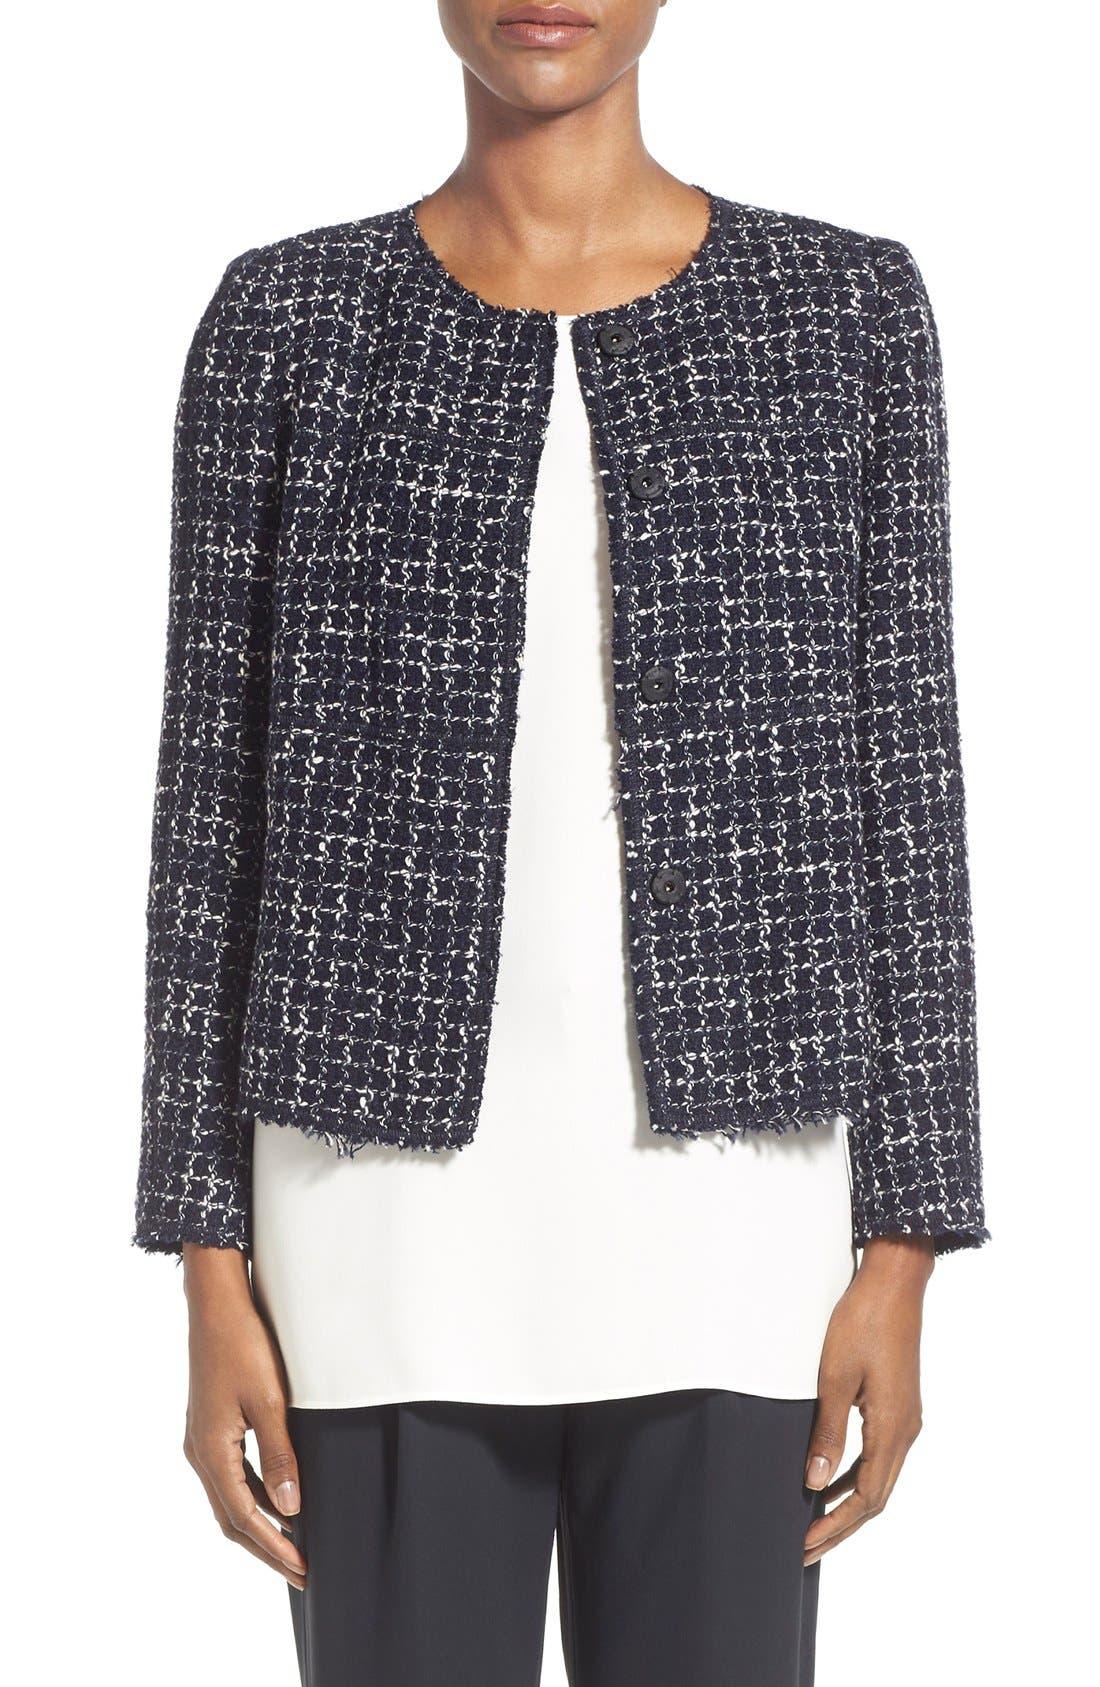 Alternate Image 1 Selected - Lafayette 148 New York 'Dani - Tempered Tweed' Jacket (Regular & Petite)